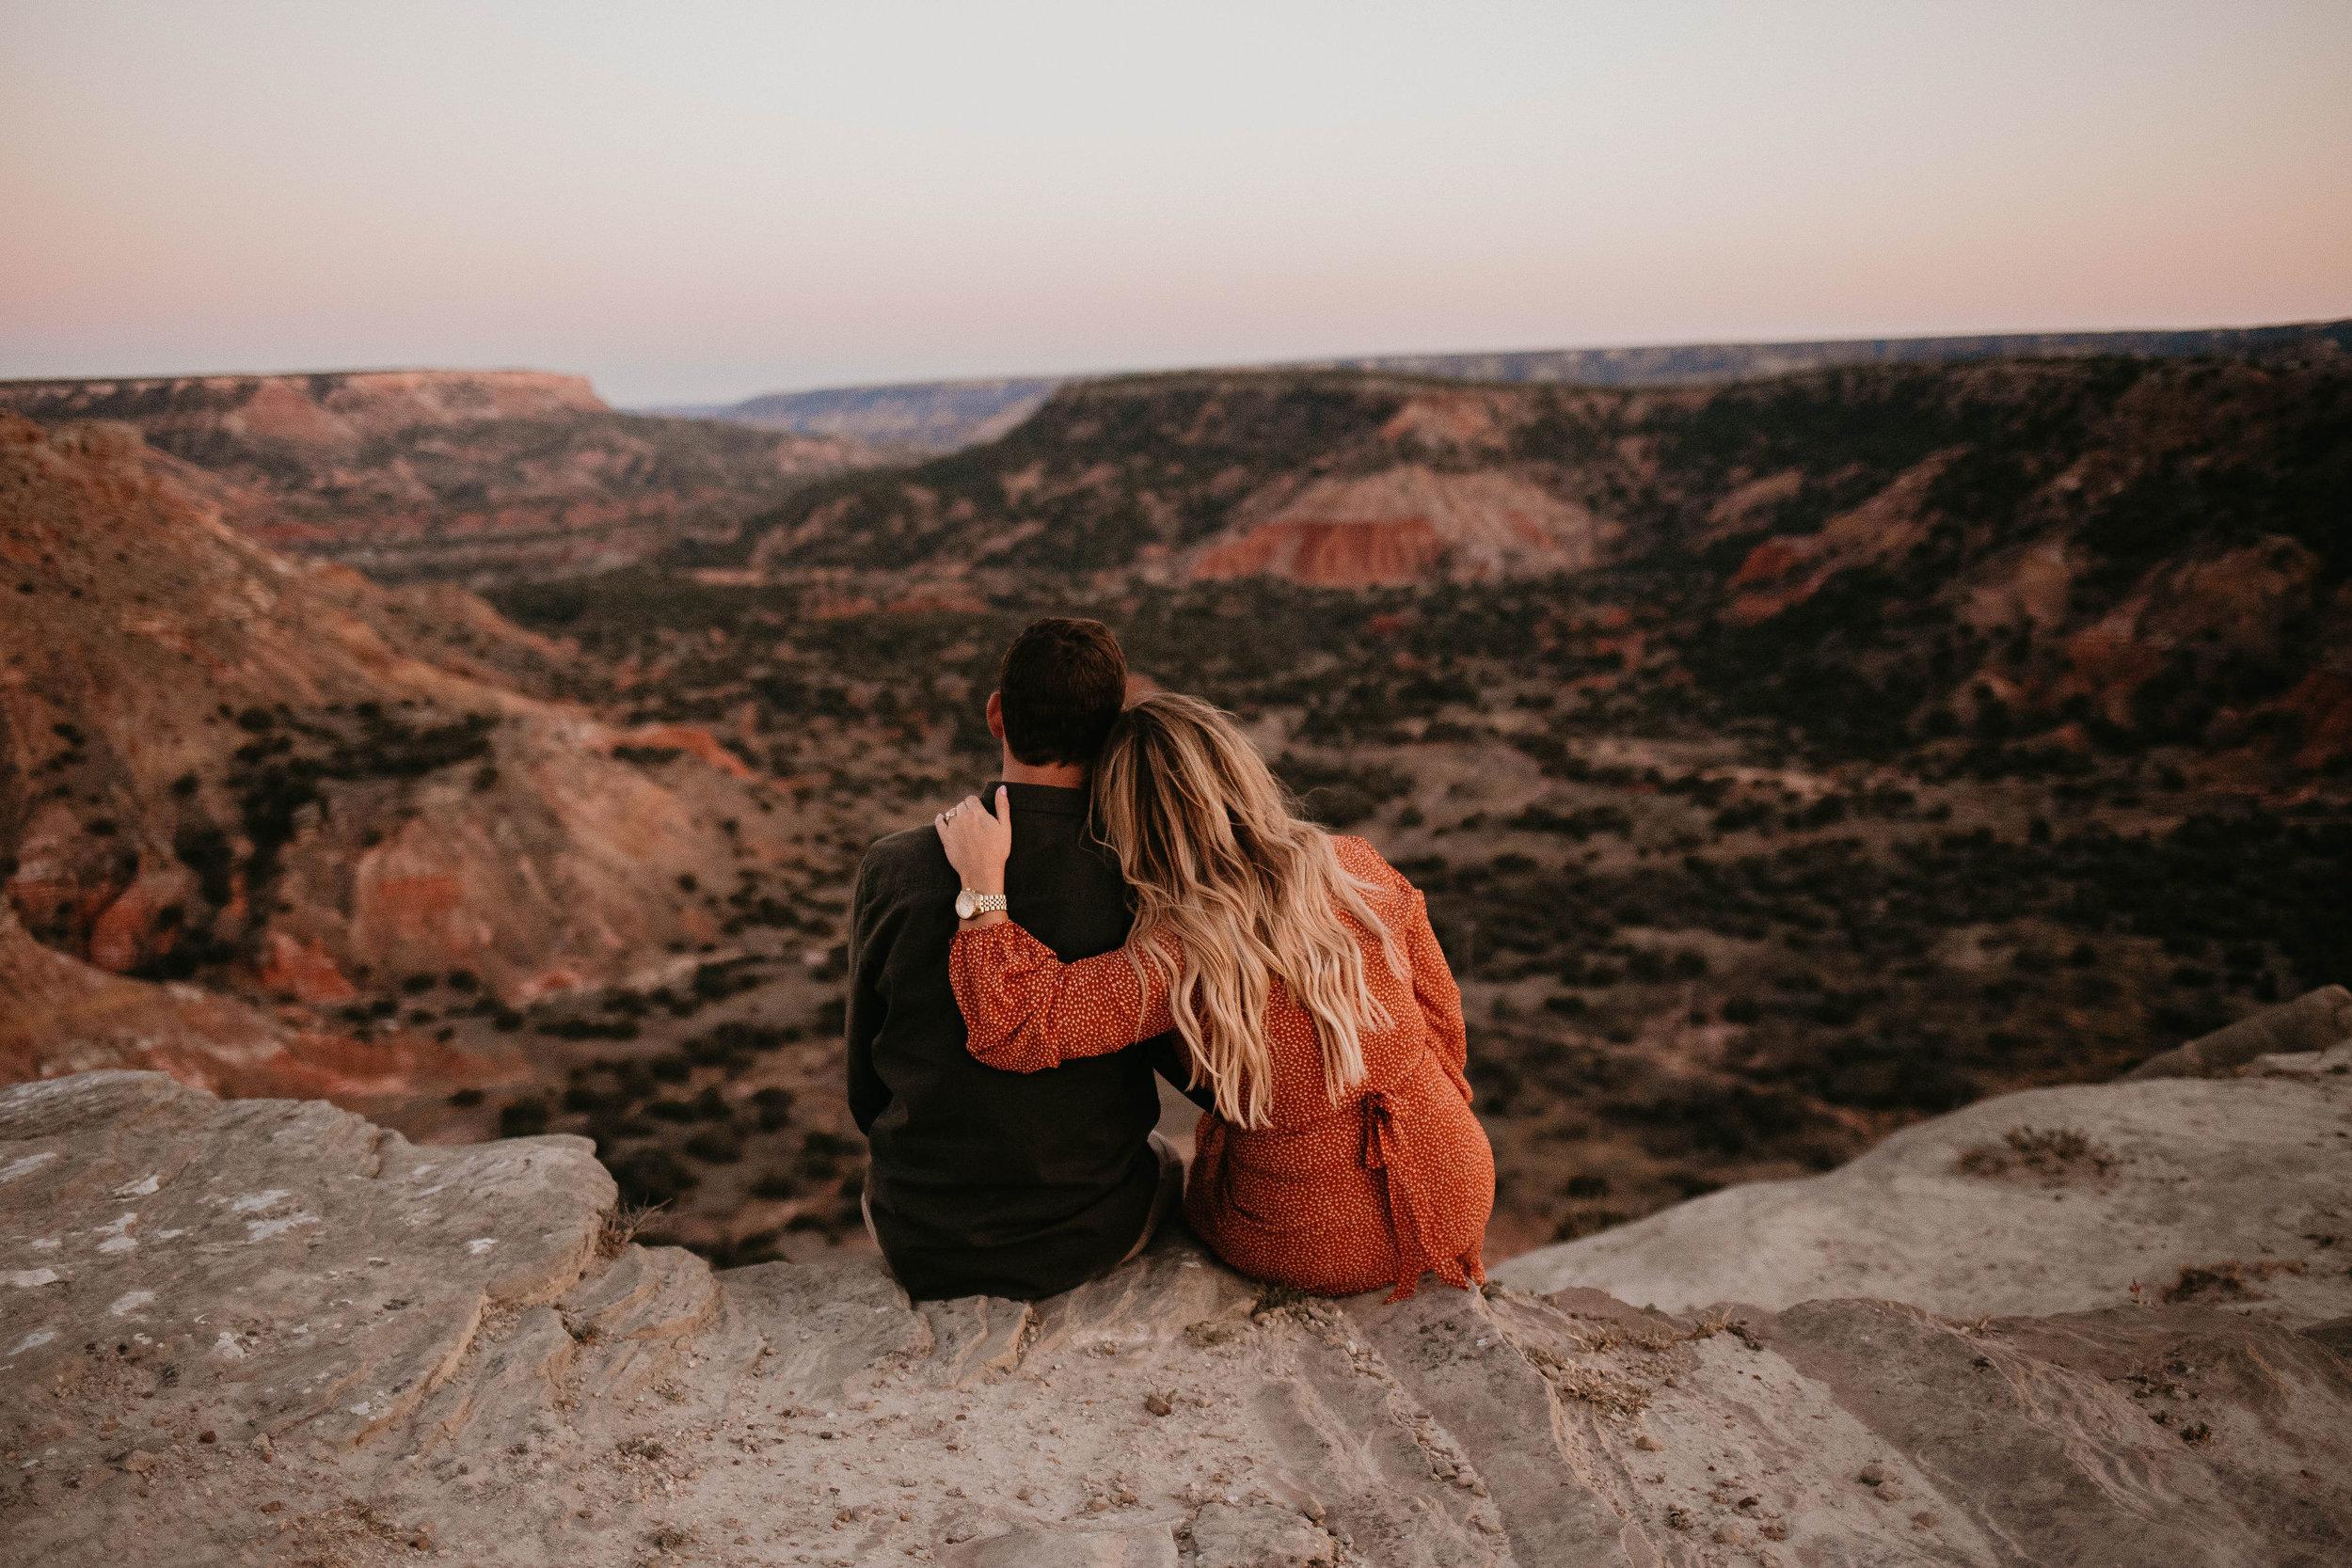 Lubbock Photographer | Lubbock Wedding & Engagement Photographer | Kailee Ann Photography | Palo Duro Canyon Photo Session